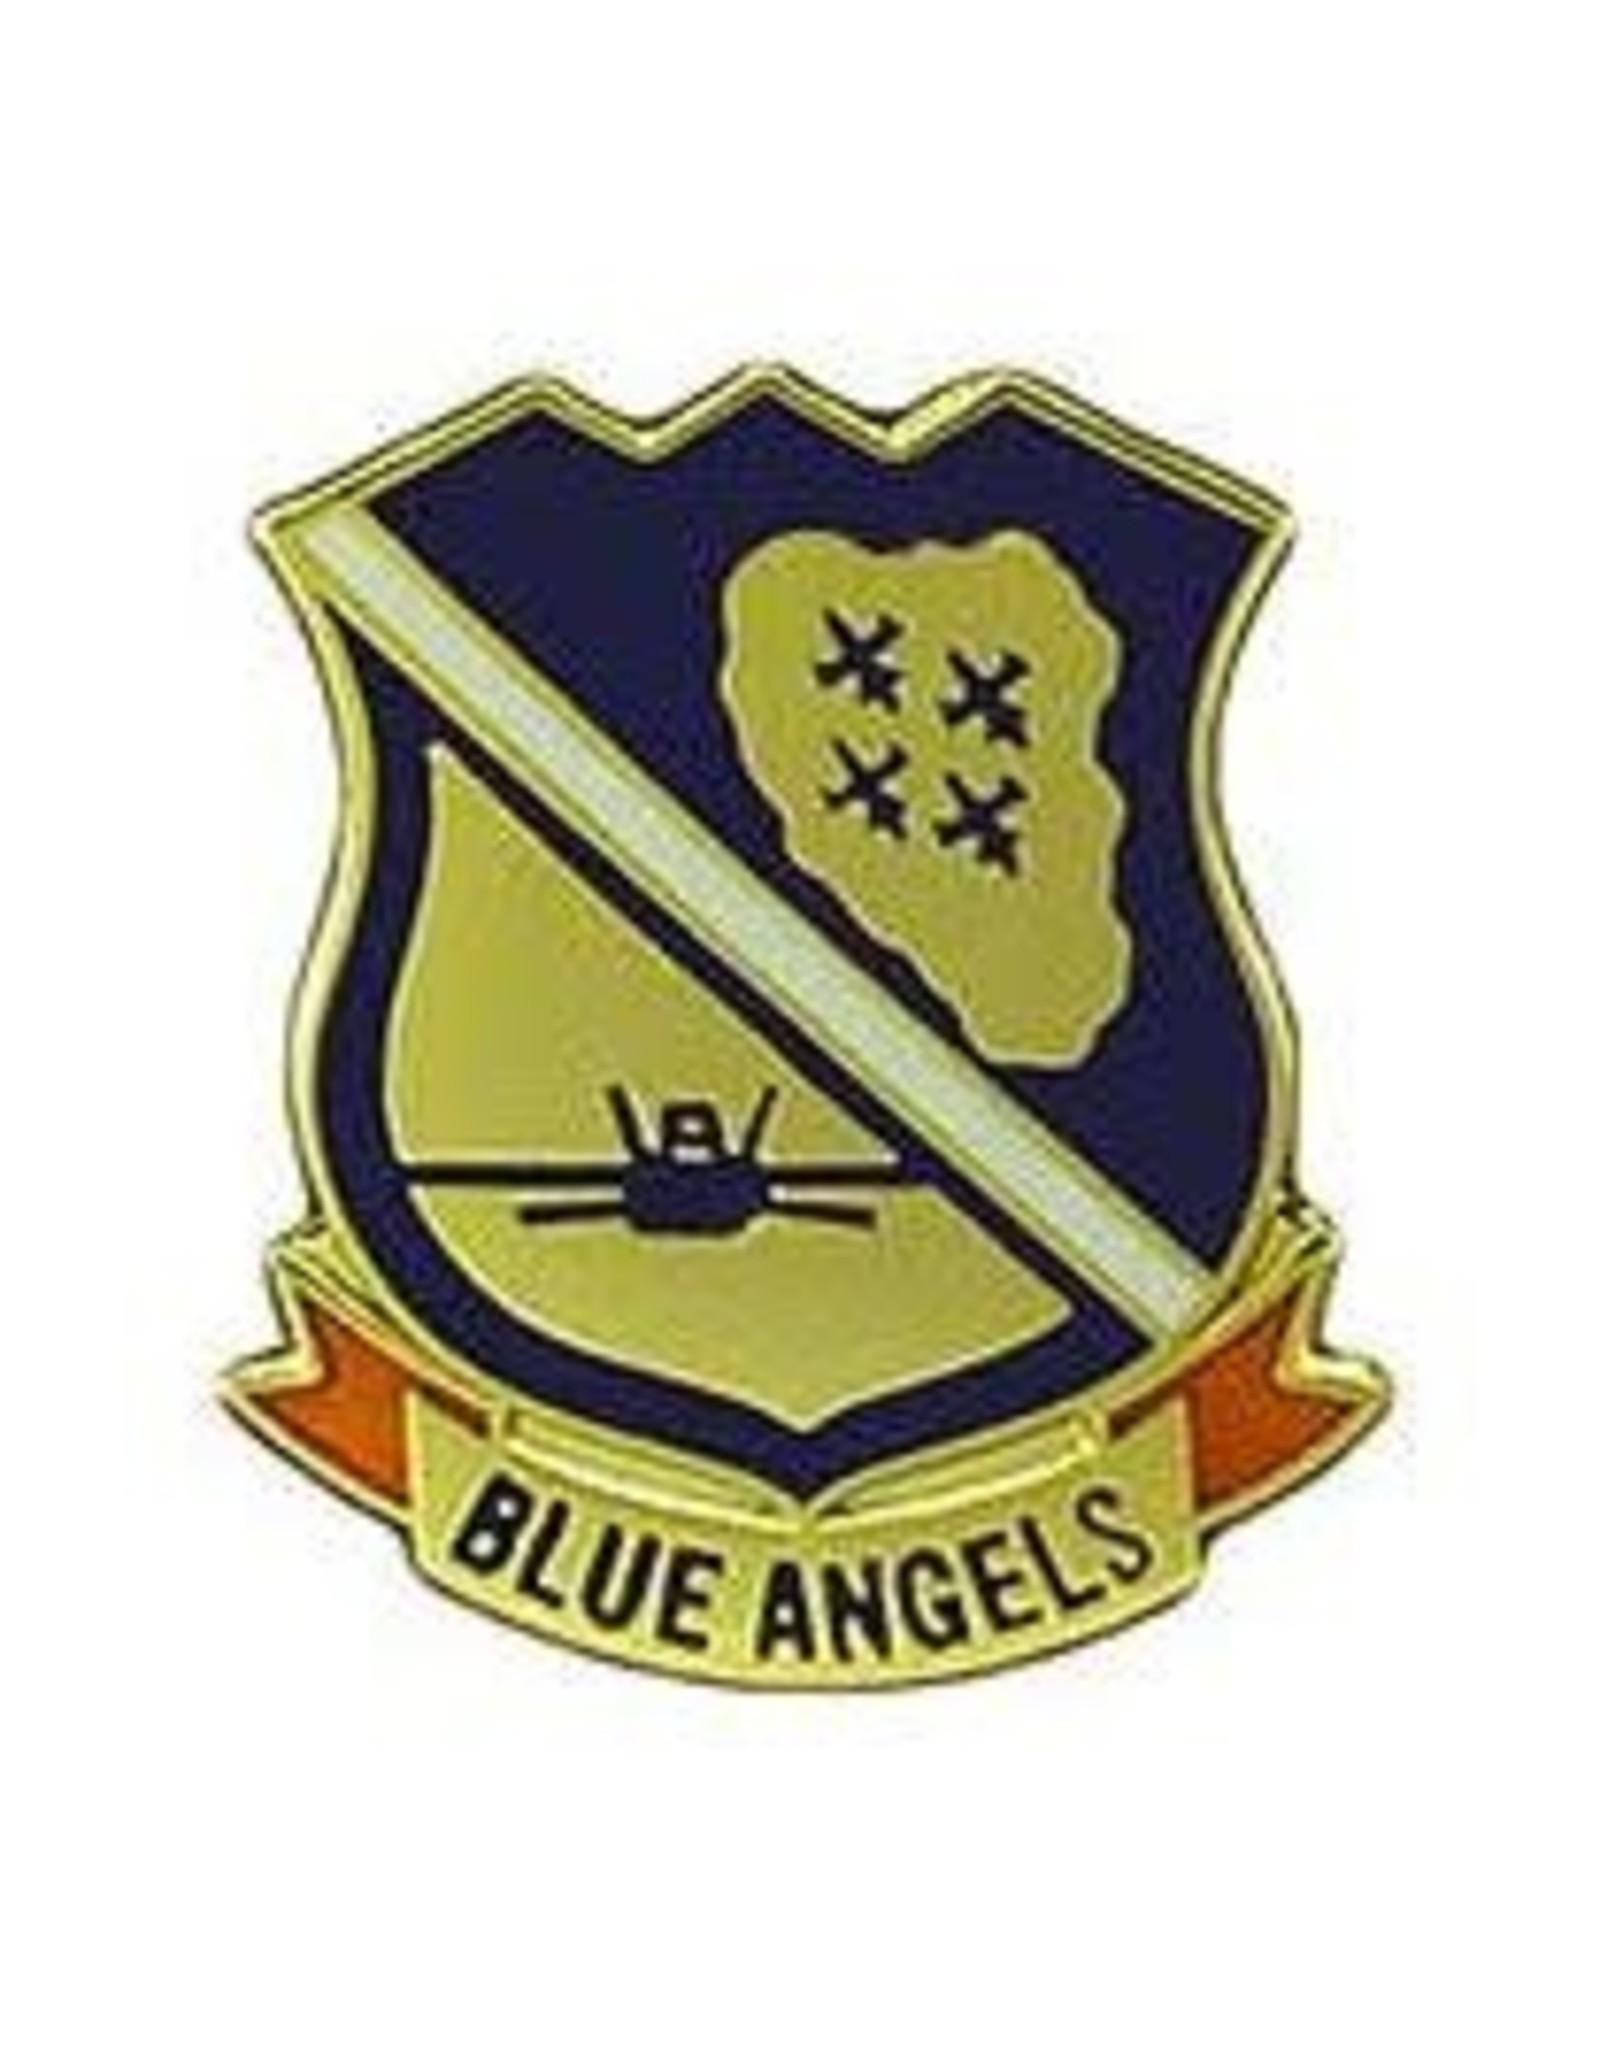 Pin - A/B Logo Tab